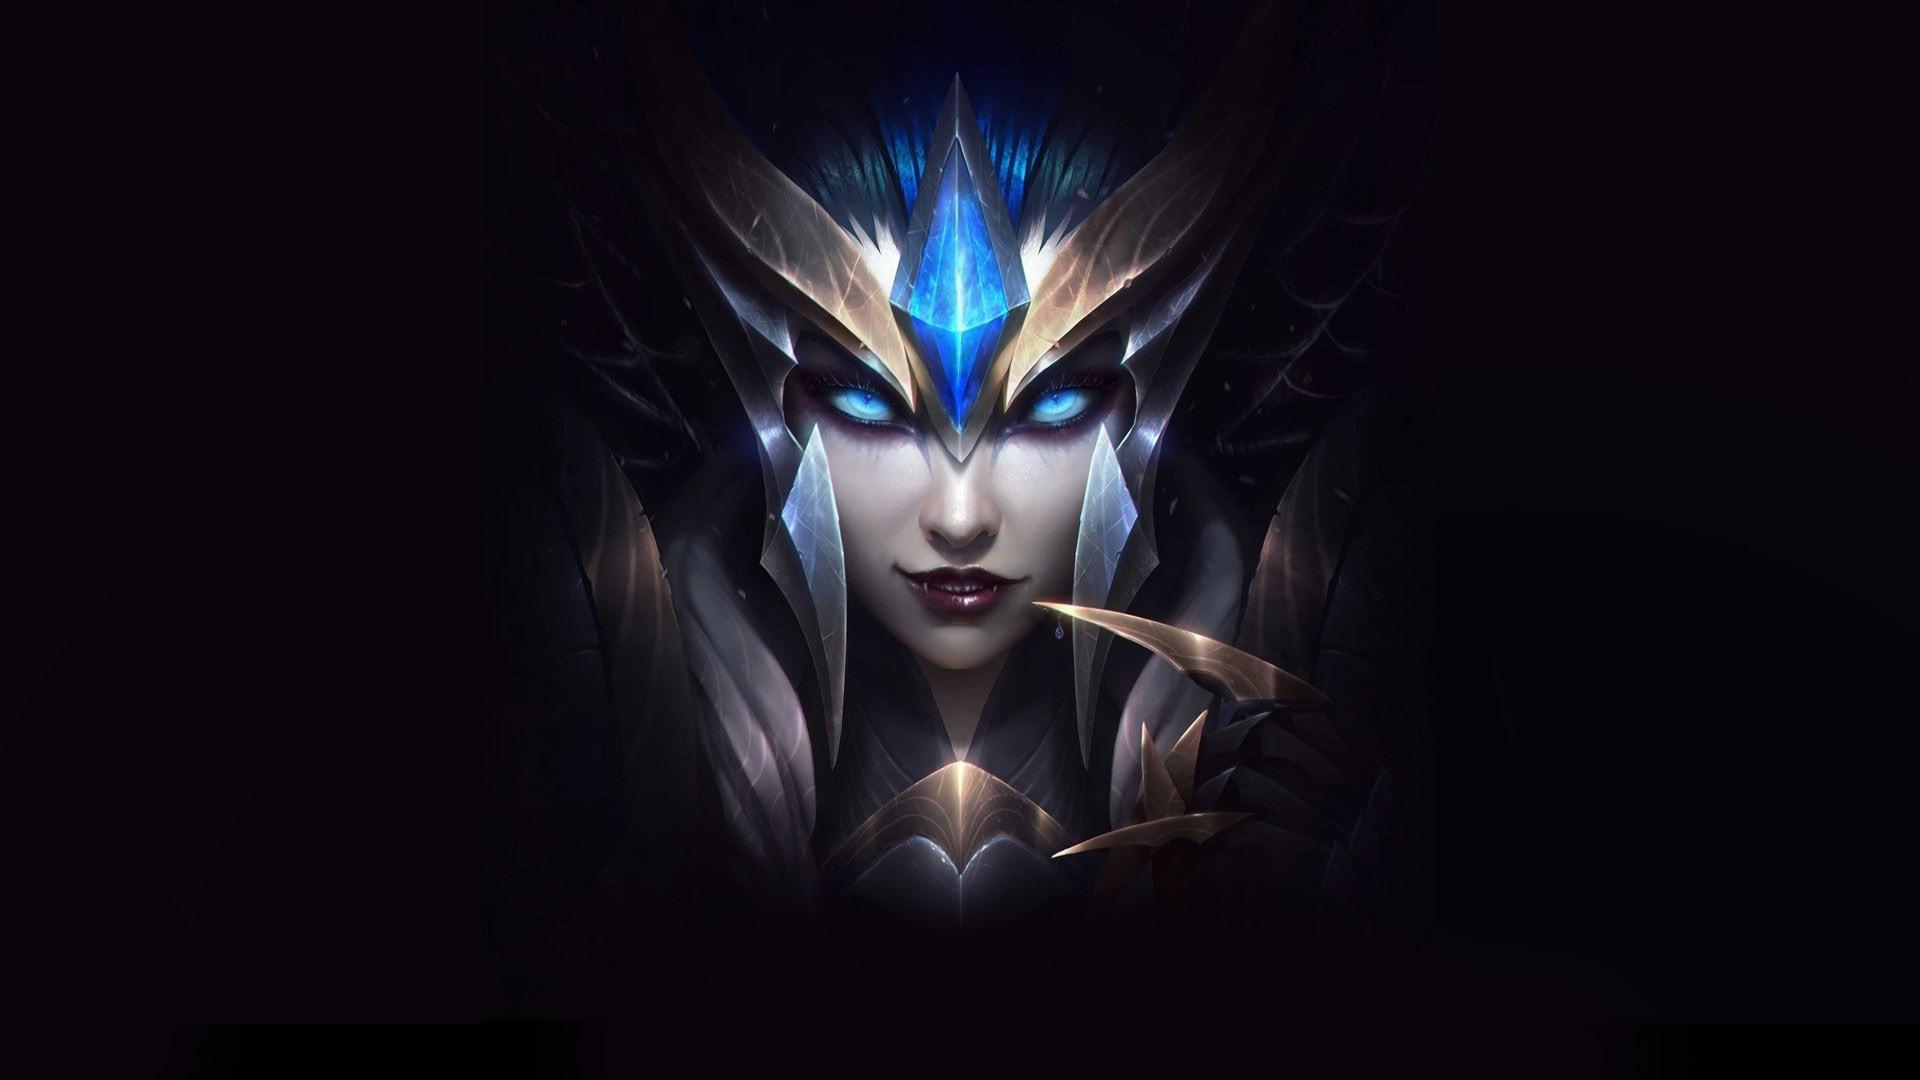 League Of Legends hd